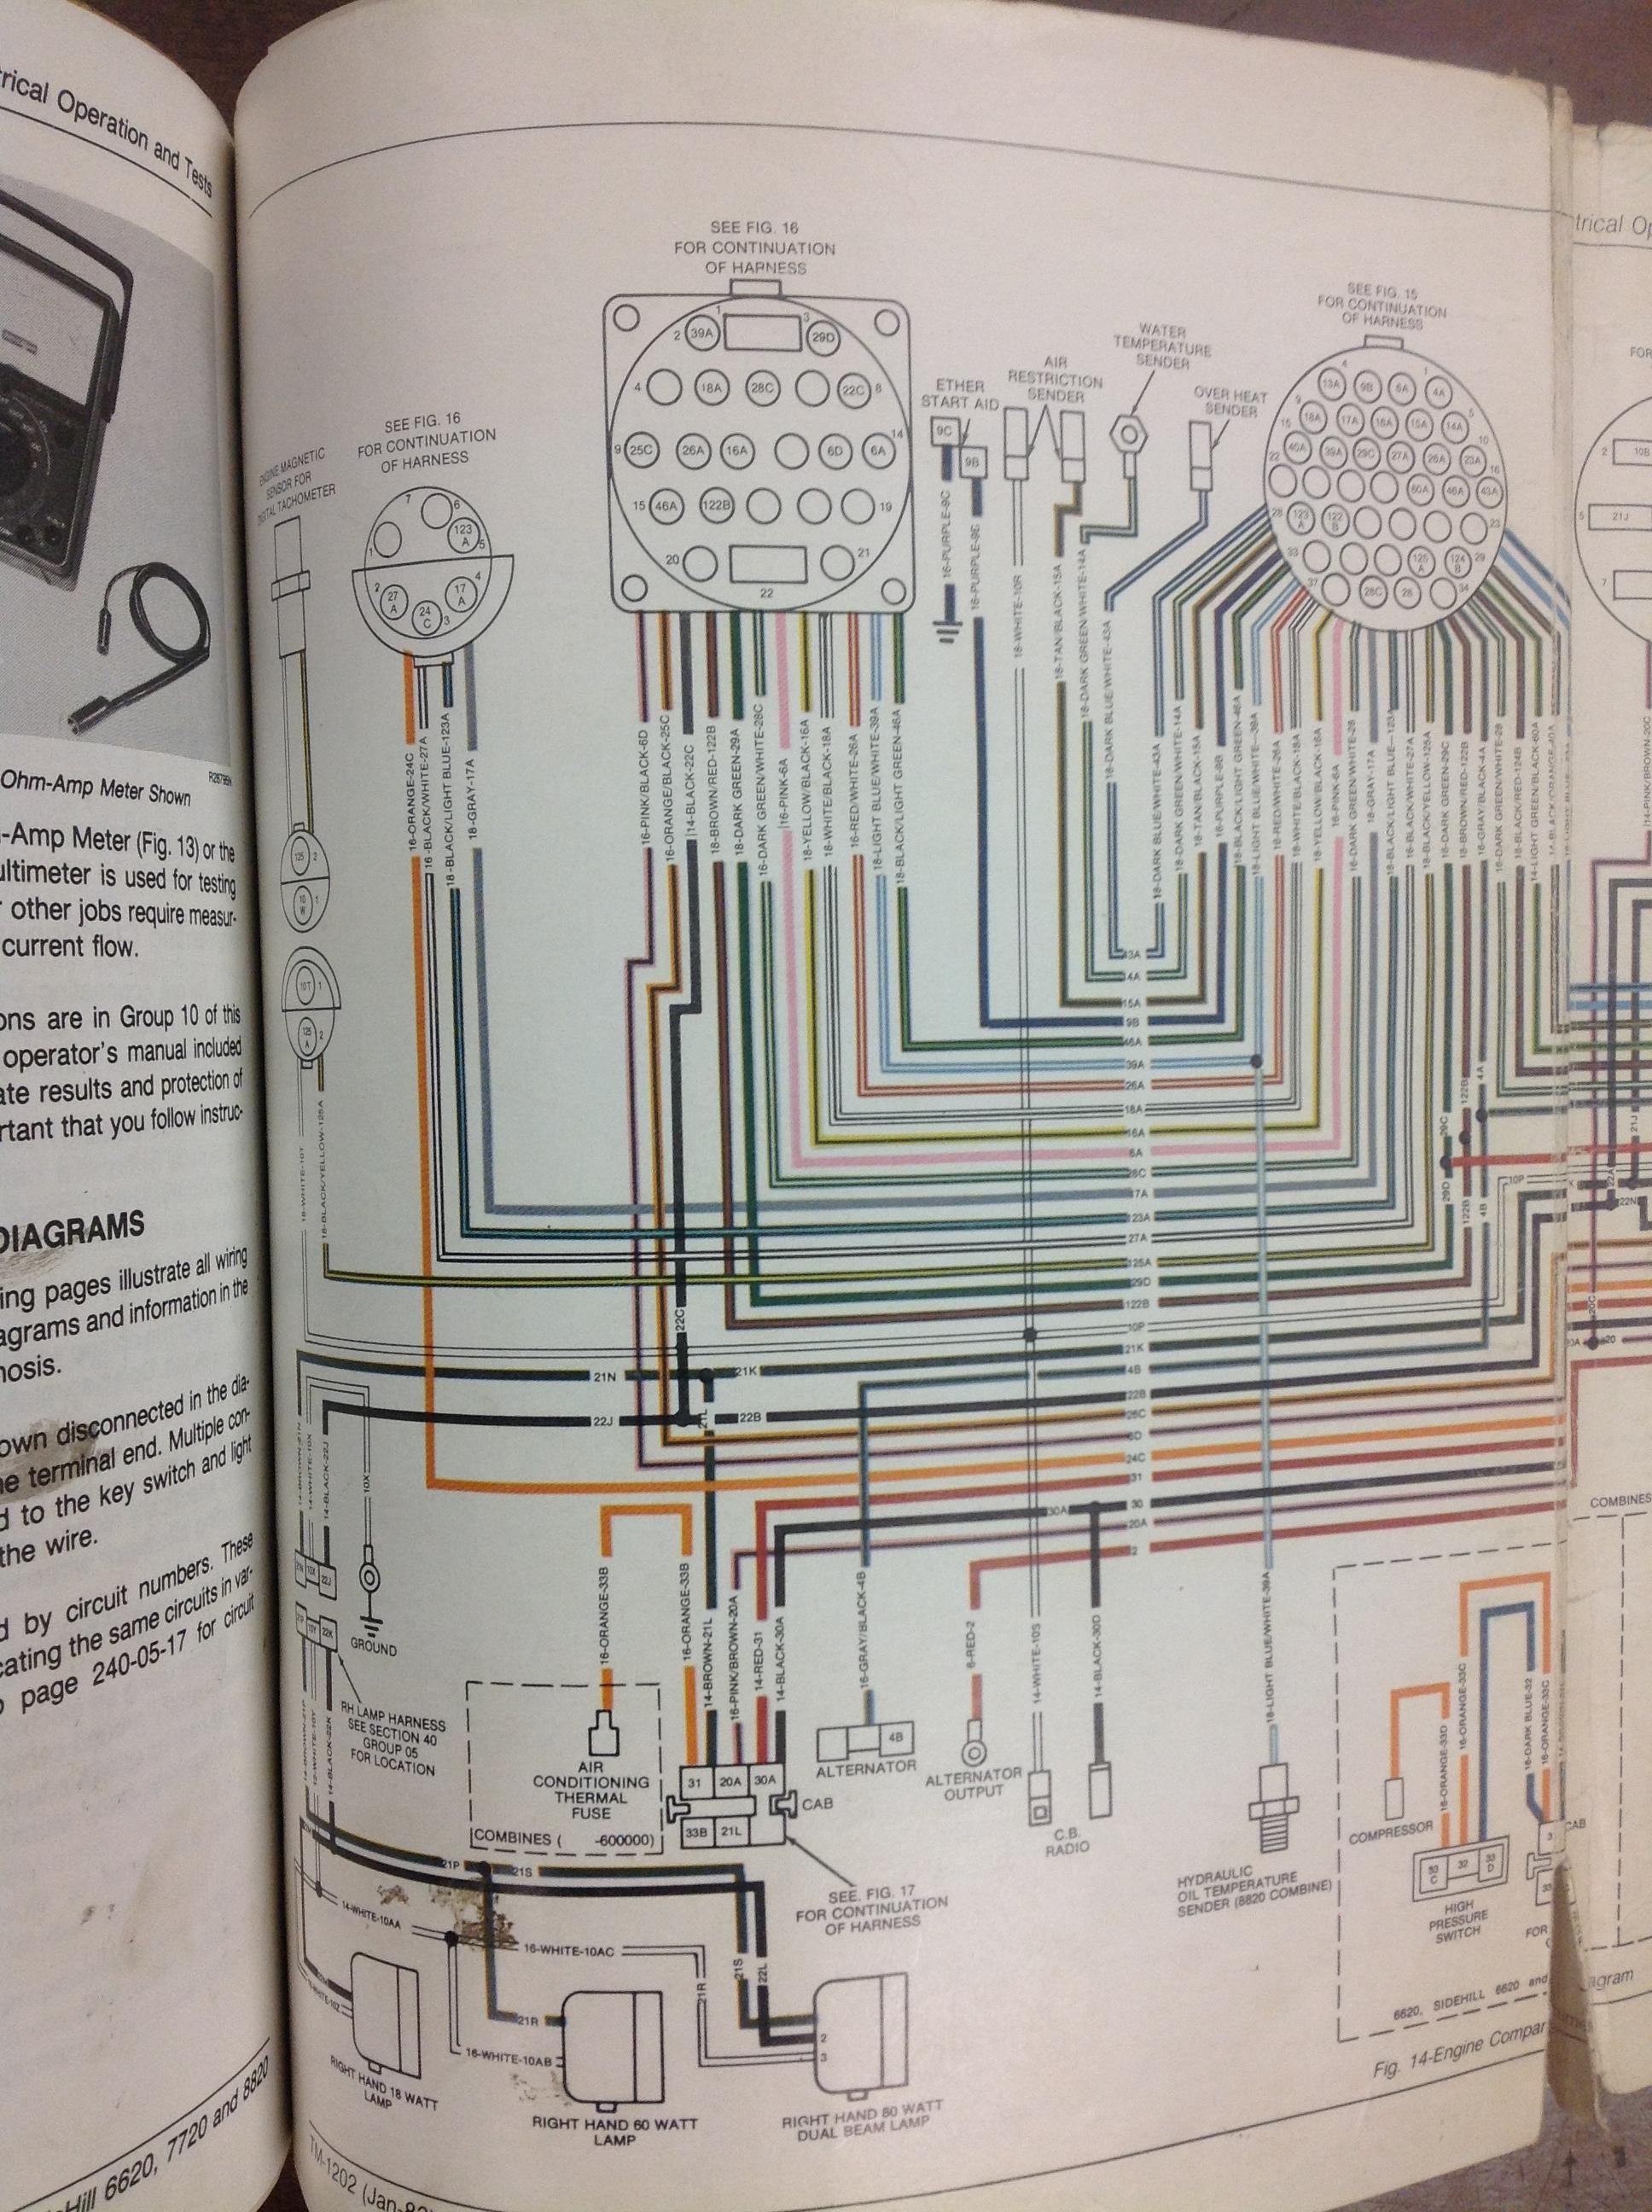 6620 digital tach reads 000 | The Combine Forum | John Deere Tach Wiring Diagram |  | The Combine Forum